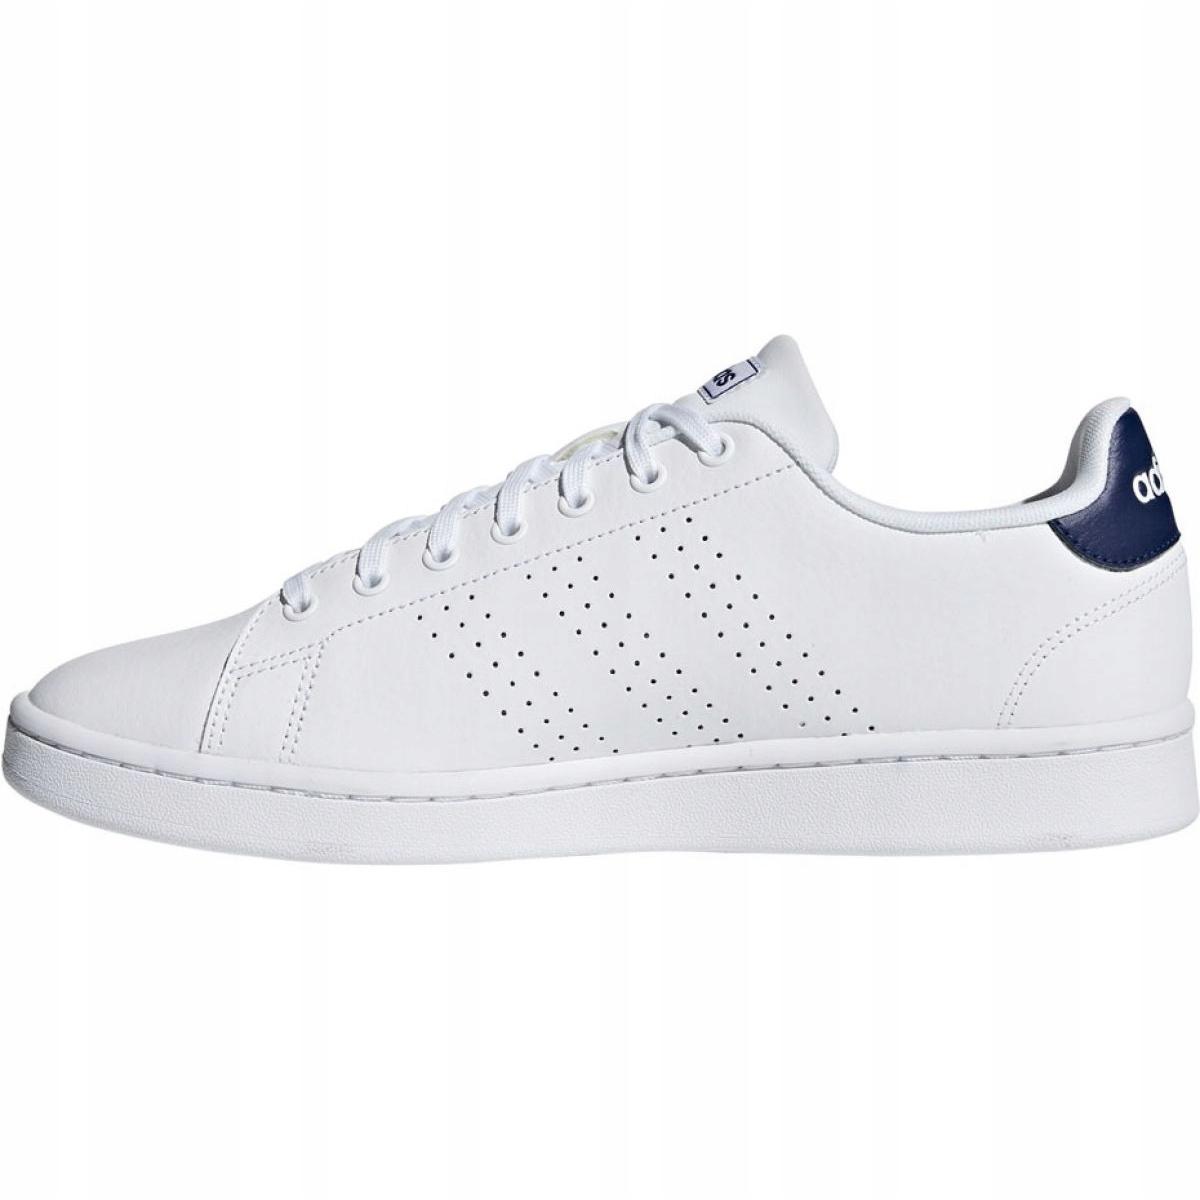 Buty adidas Advantage M F36423 białe